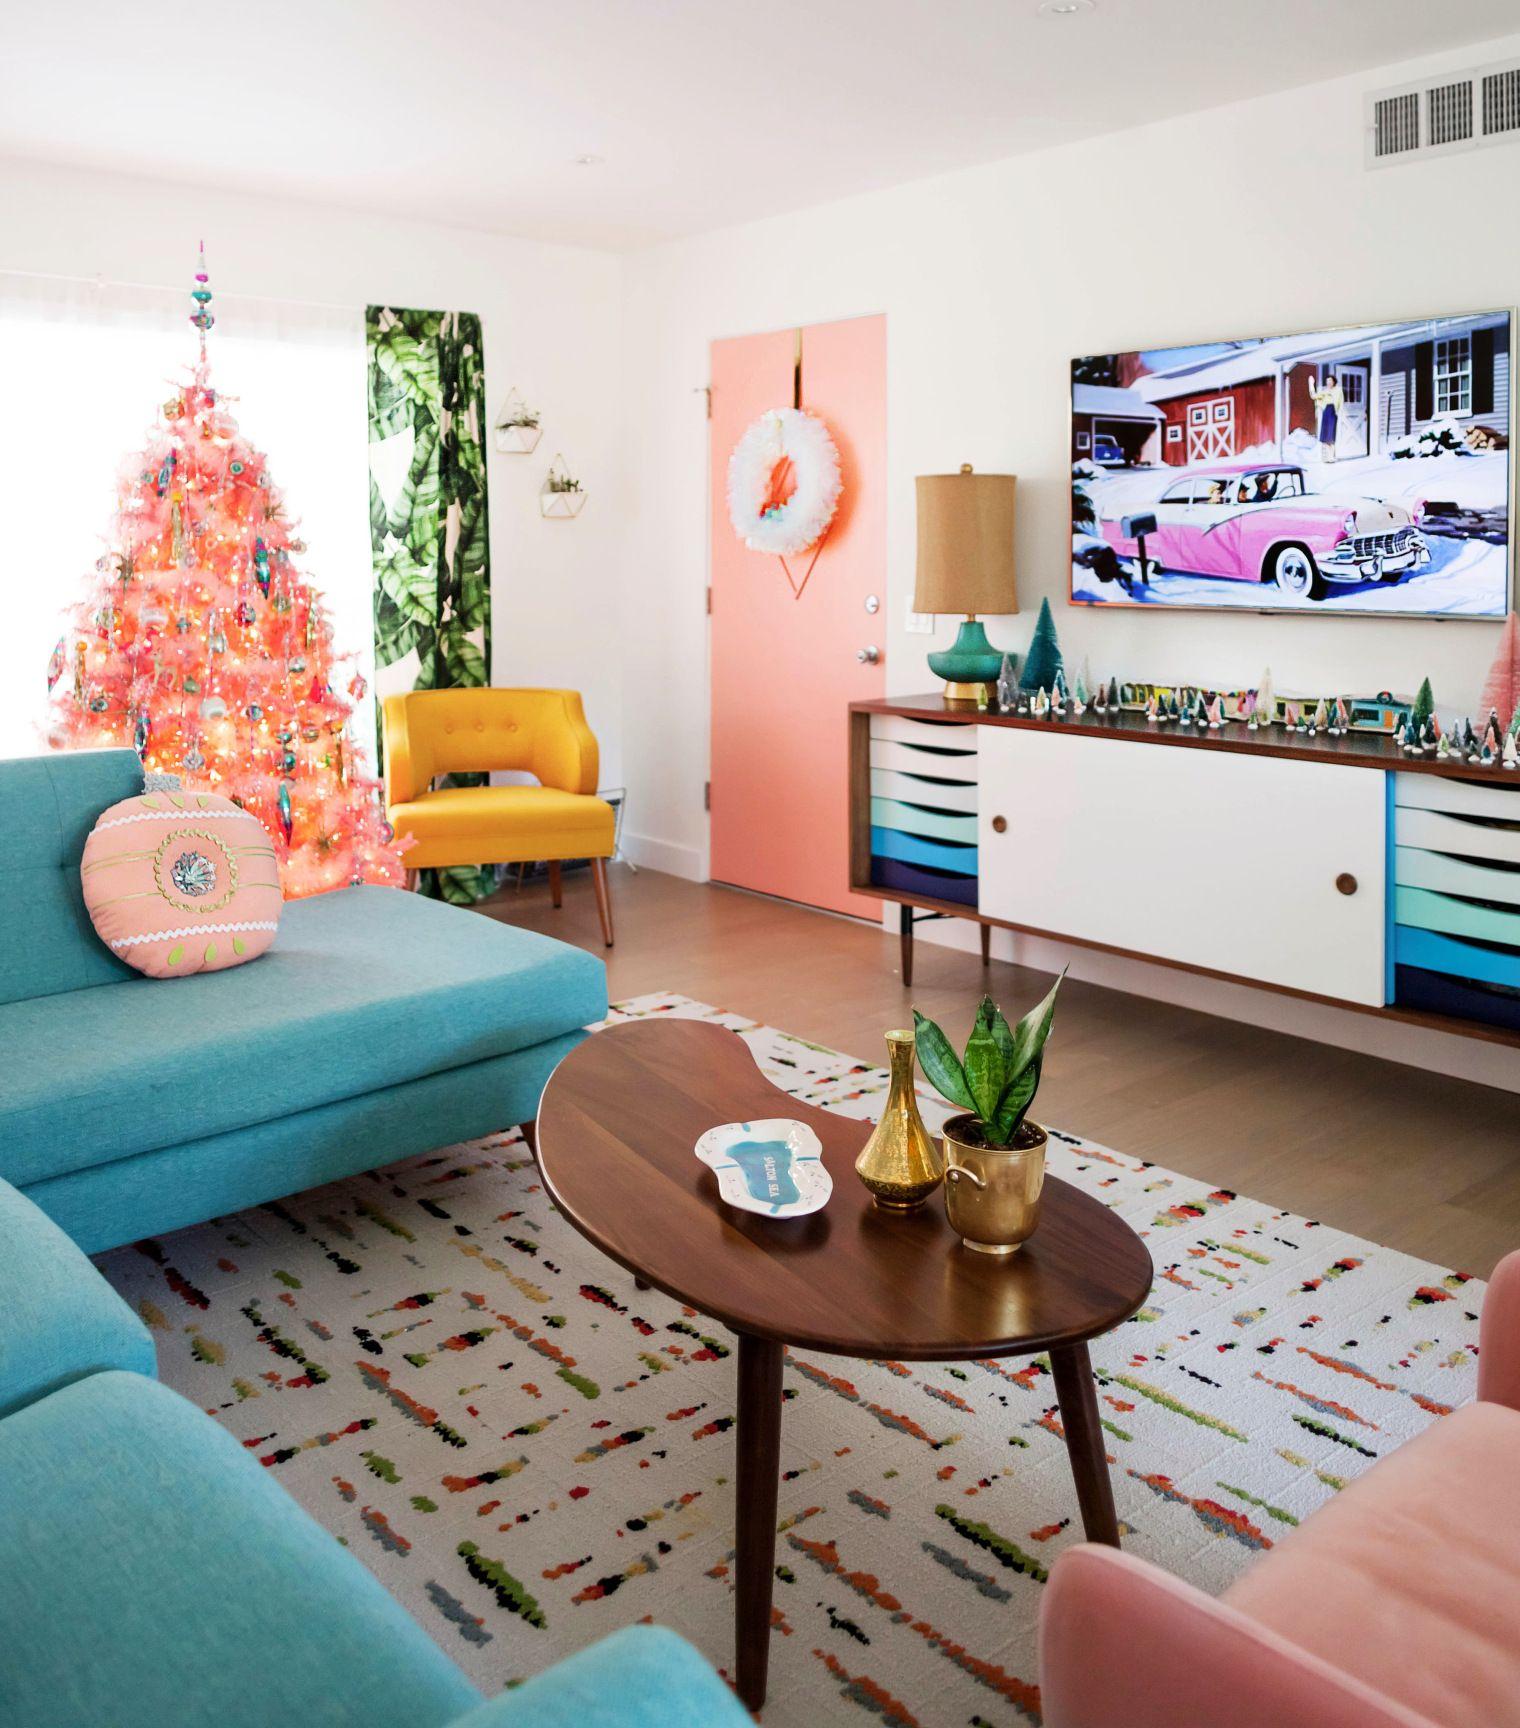 Mid Century Palm Springs Christmas Decor Jpeg Retro Living Rooms Mid Century Modern Living Room Mid Century Modern Living #retro #style #living #room